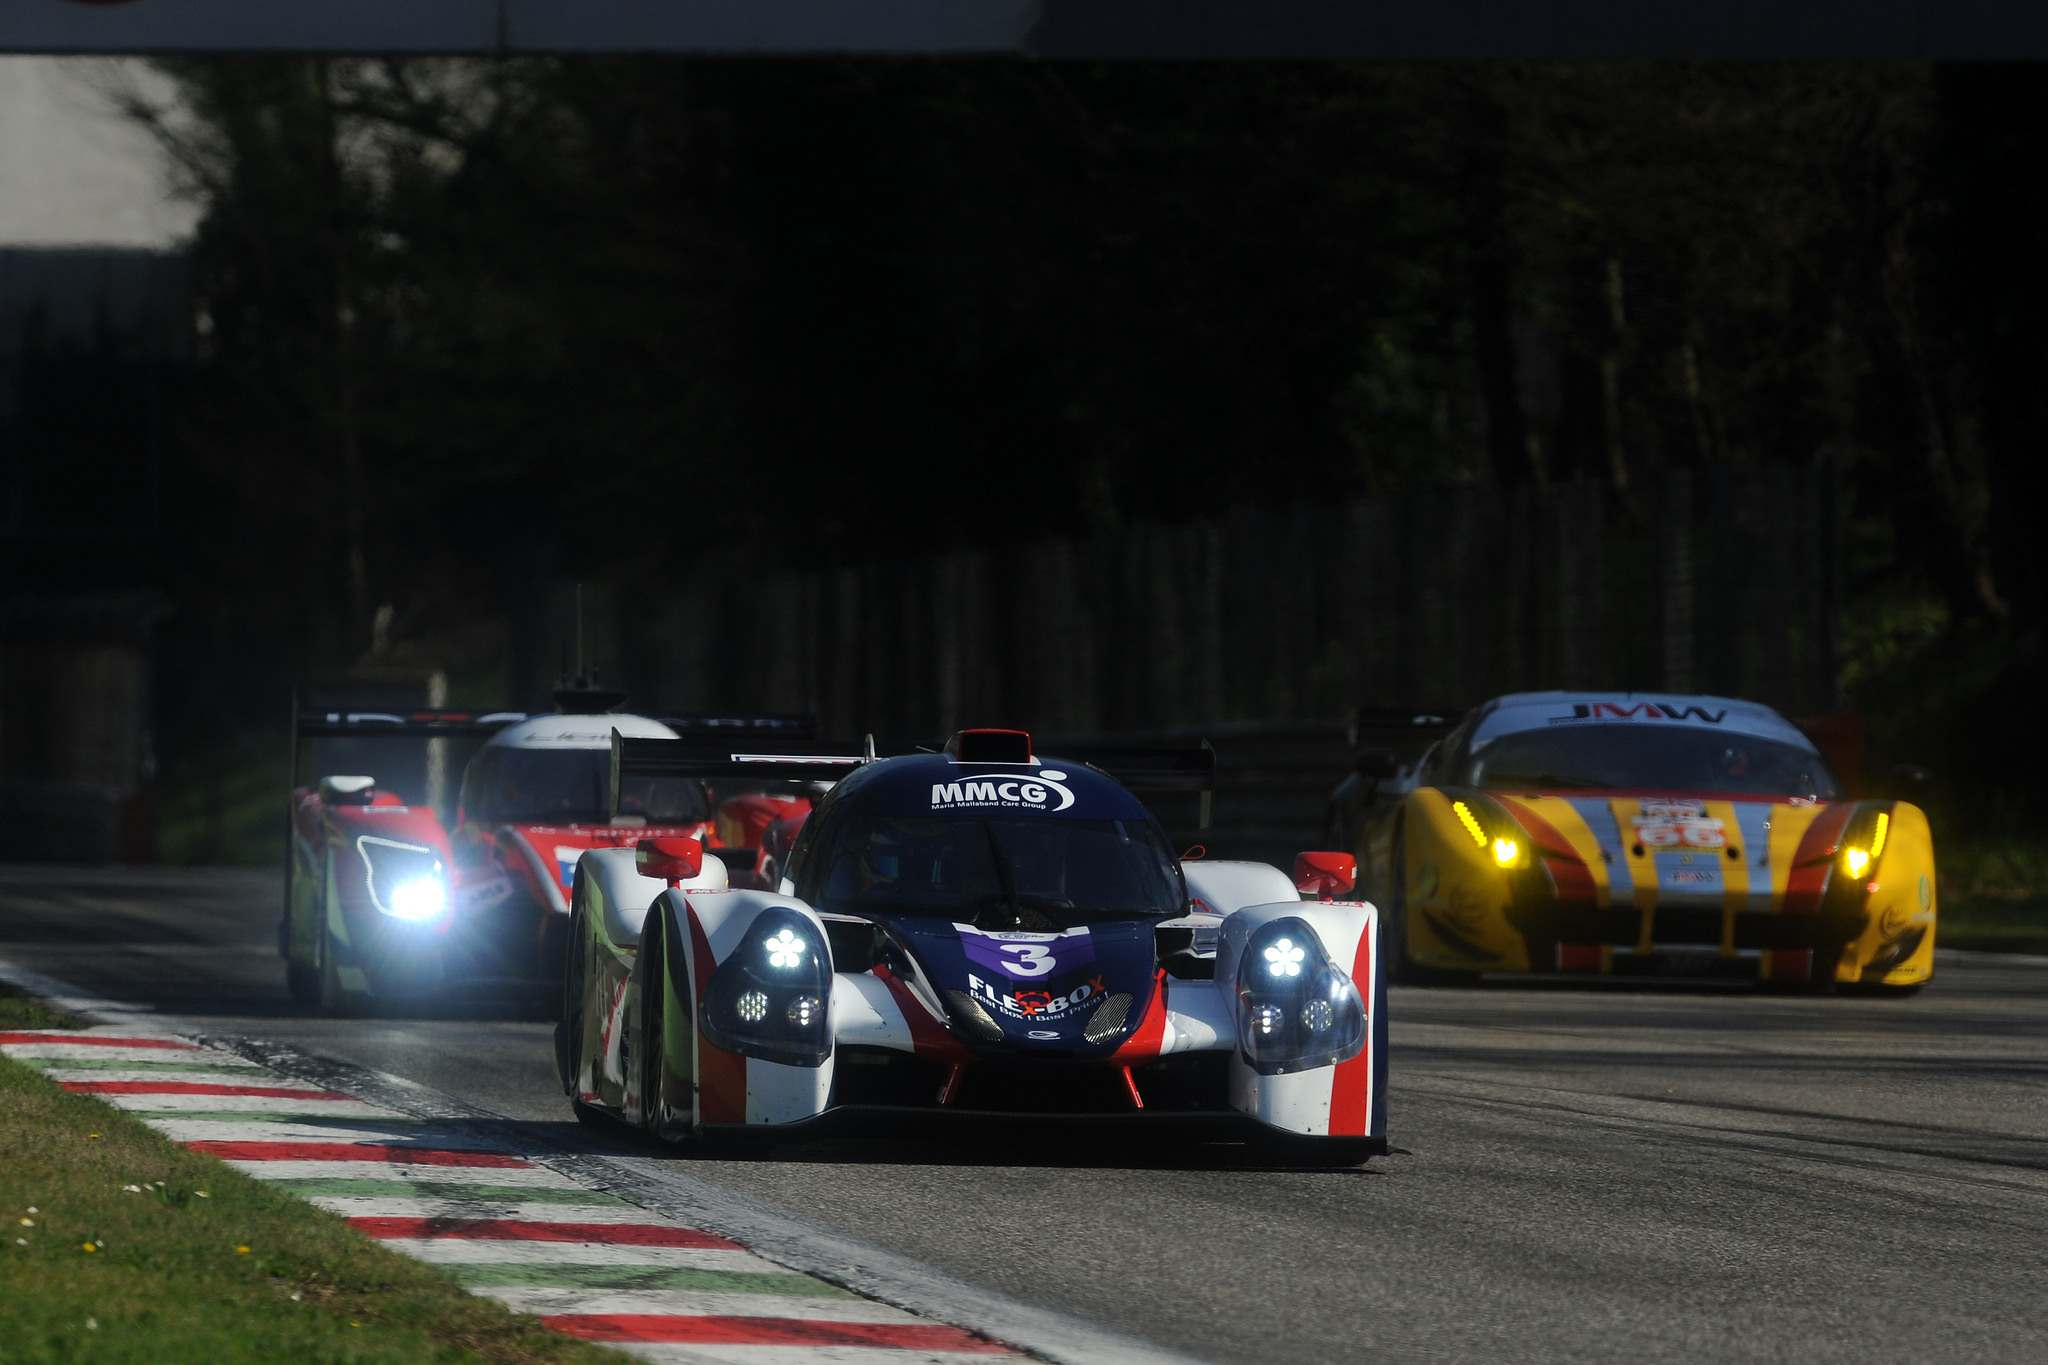 unitedautosports1 United Autosports in Monza